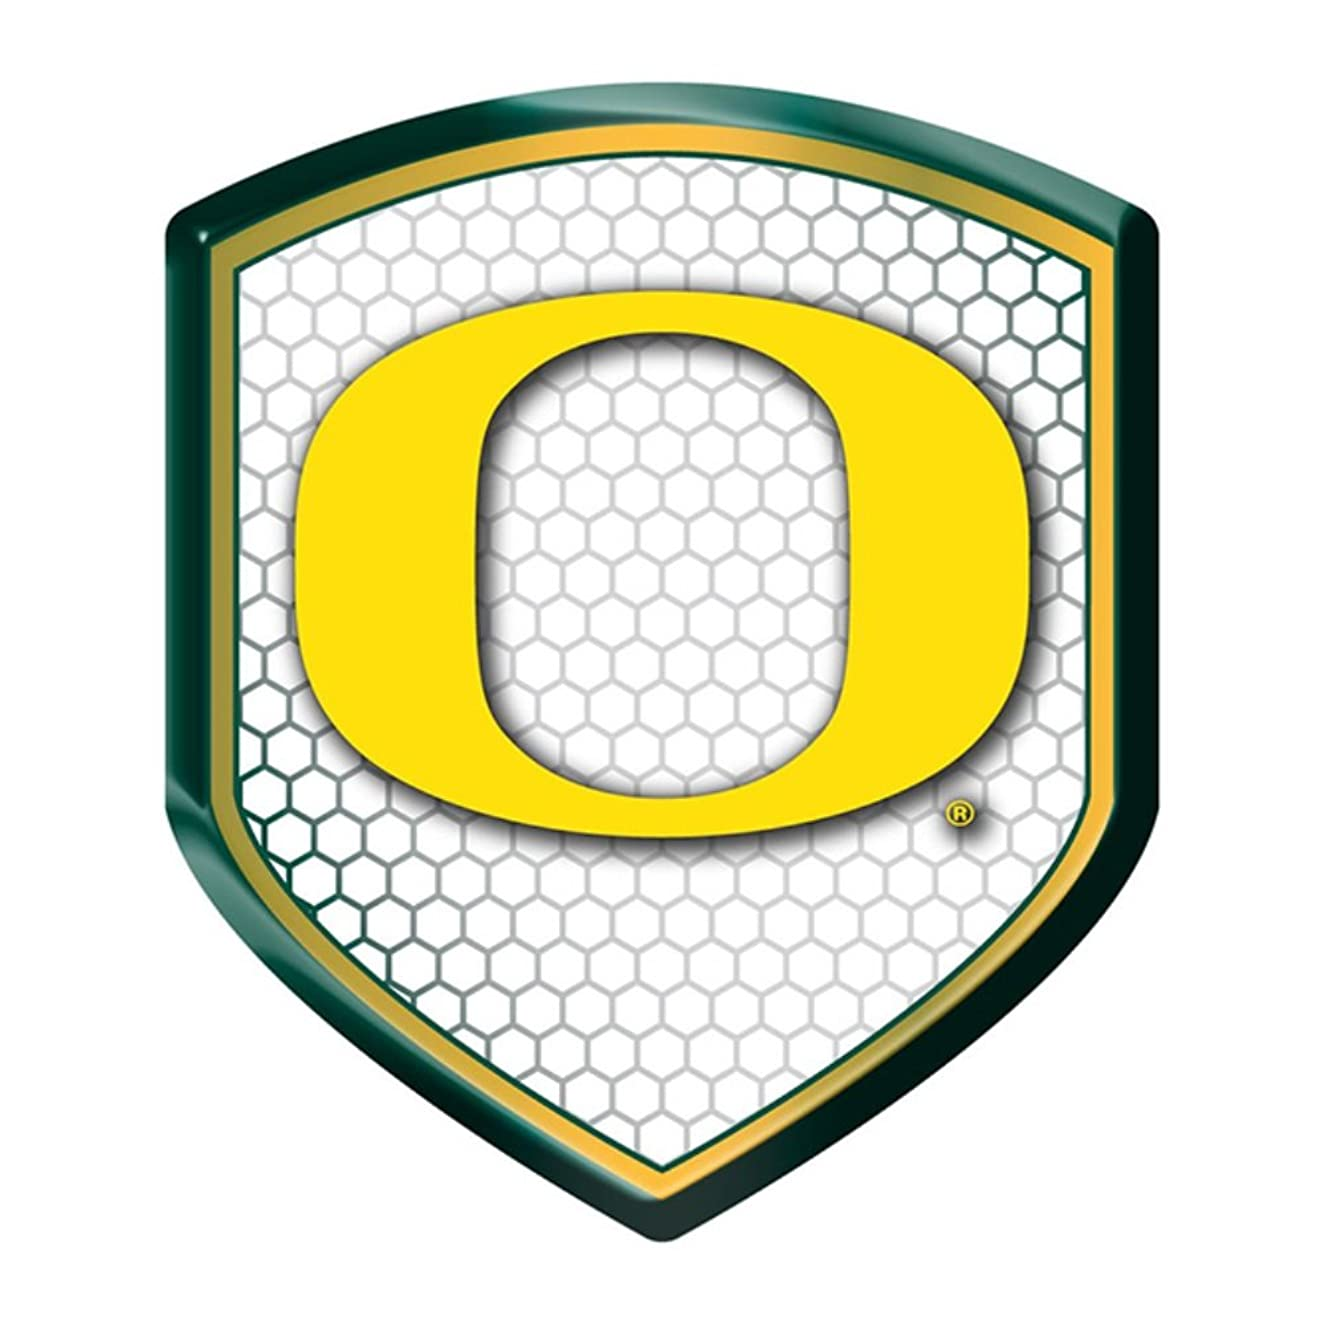 Oregon Ducks NCAA Reflector Decal Auto Shield for Car Truck Mailbox Locker Sticker College Licensed Team Logo